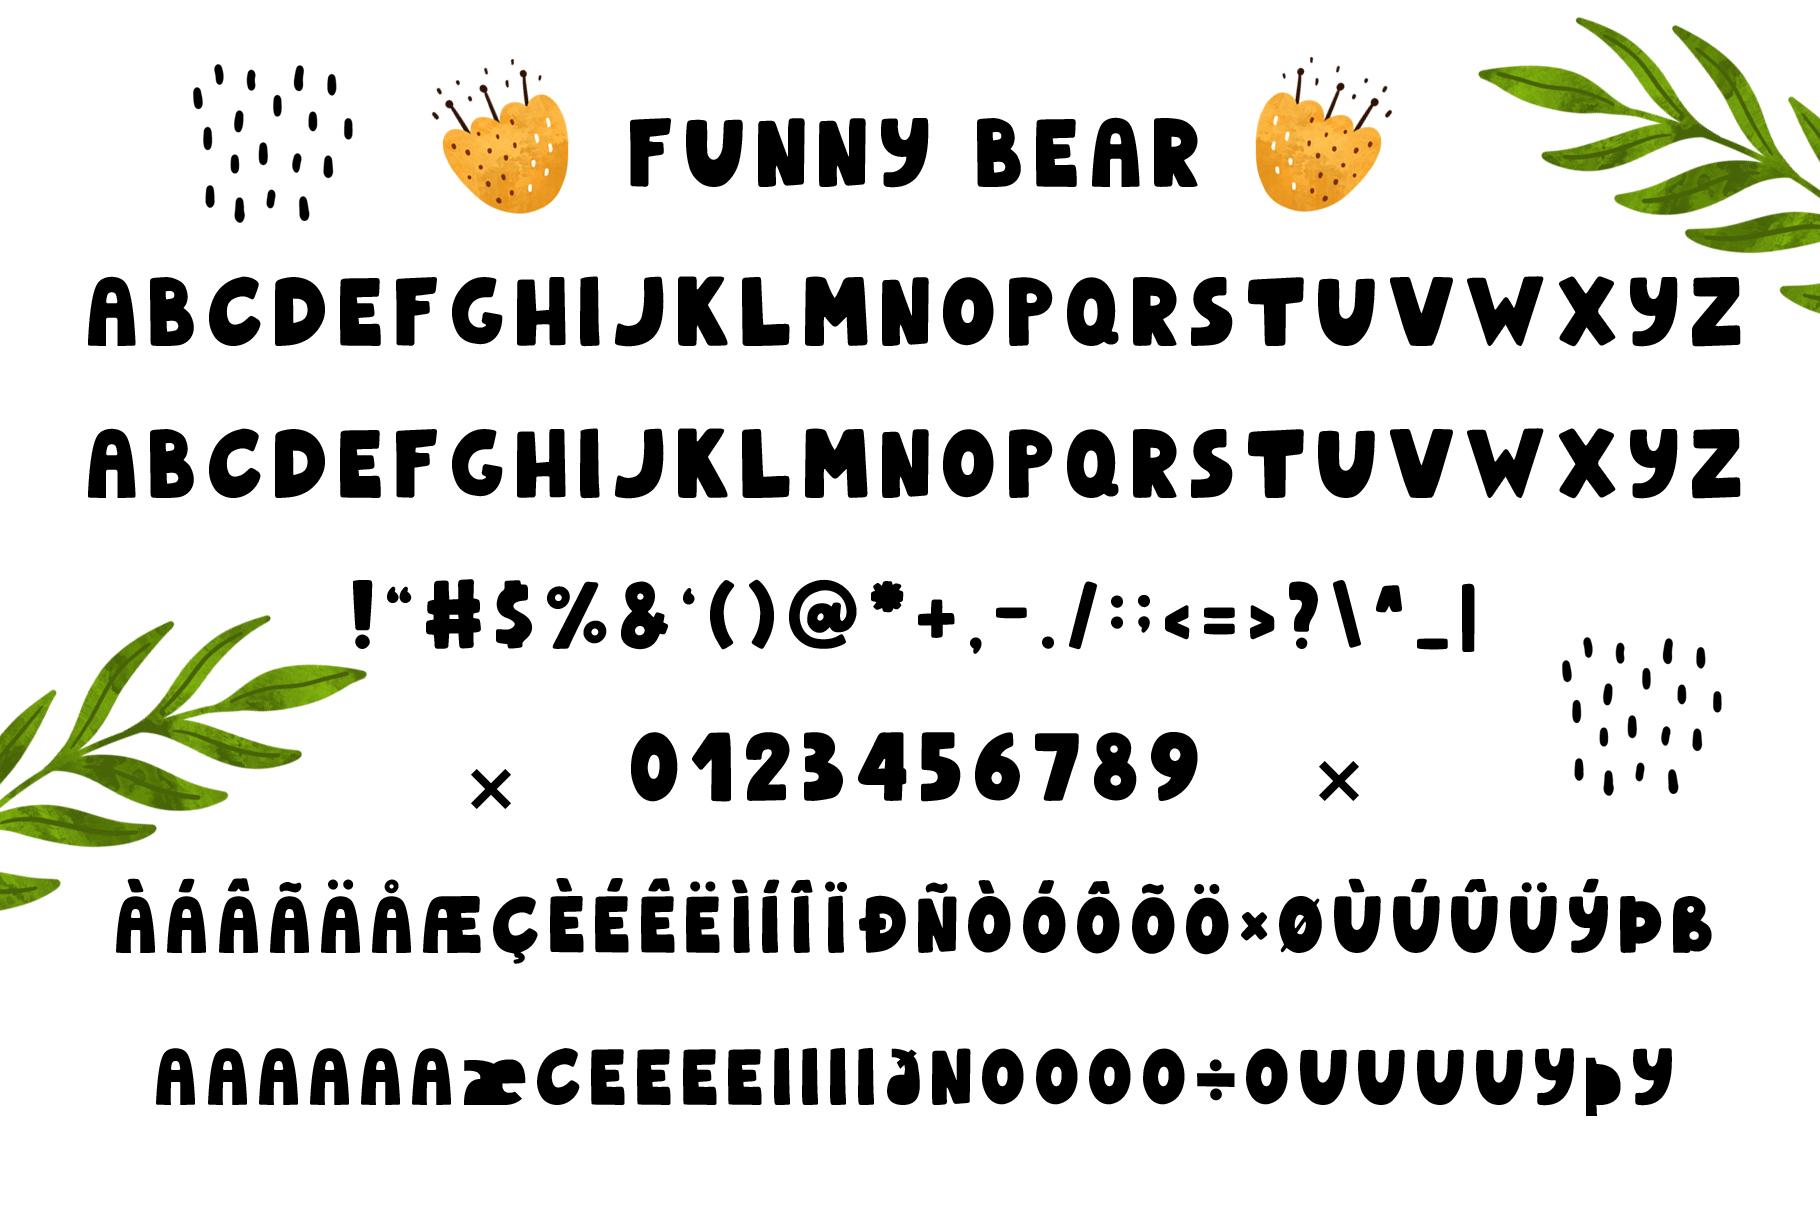 Funnybear & Funnydeer - Duo font example image 3